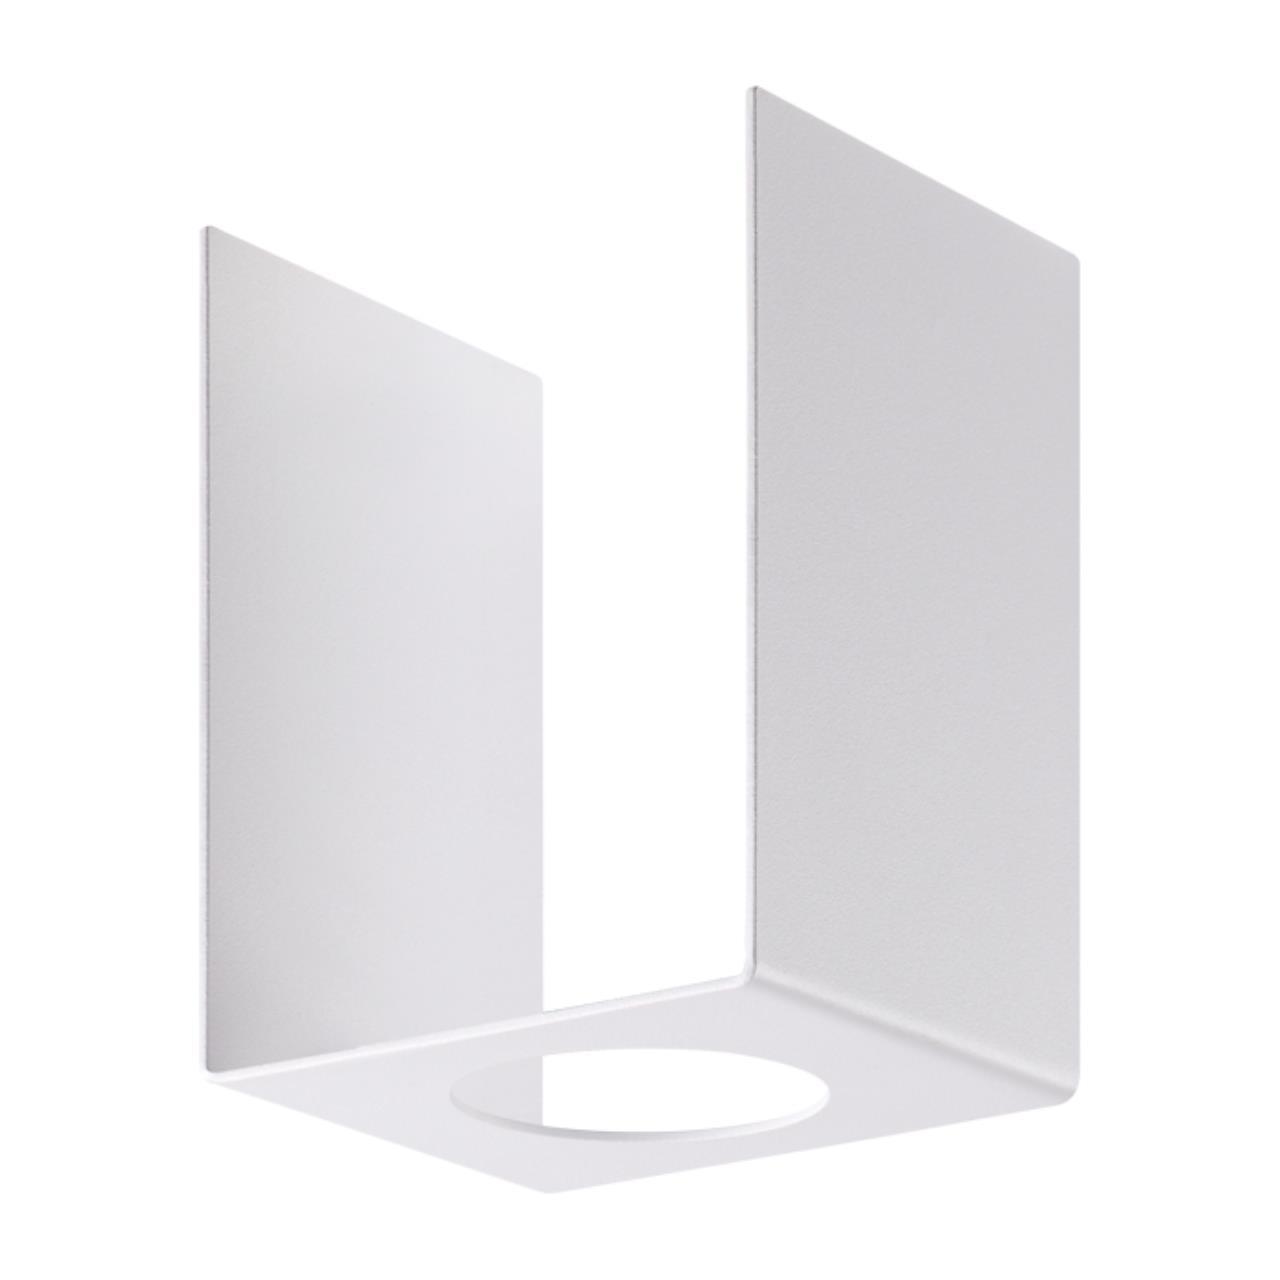 370502 KONST NT19 035 белый Декоративная рамка к артикулам 370499, 370500 LEGIO